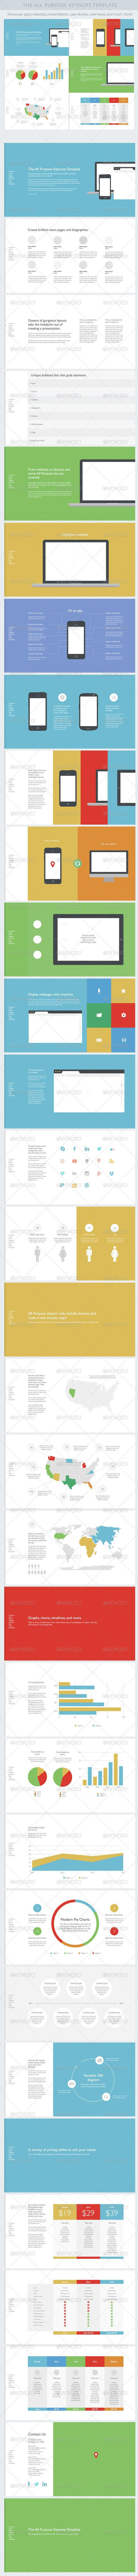 Improve Presentation SlideShare Case study slide with data chart